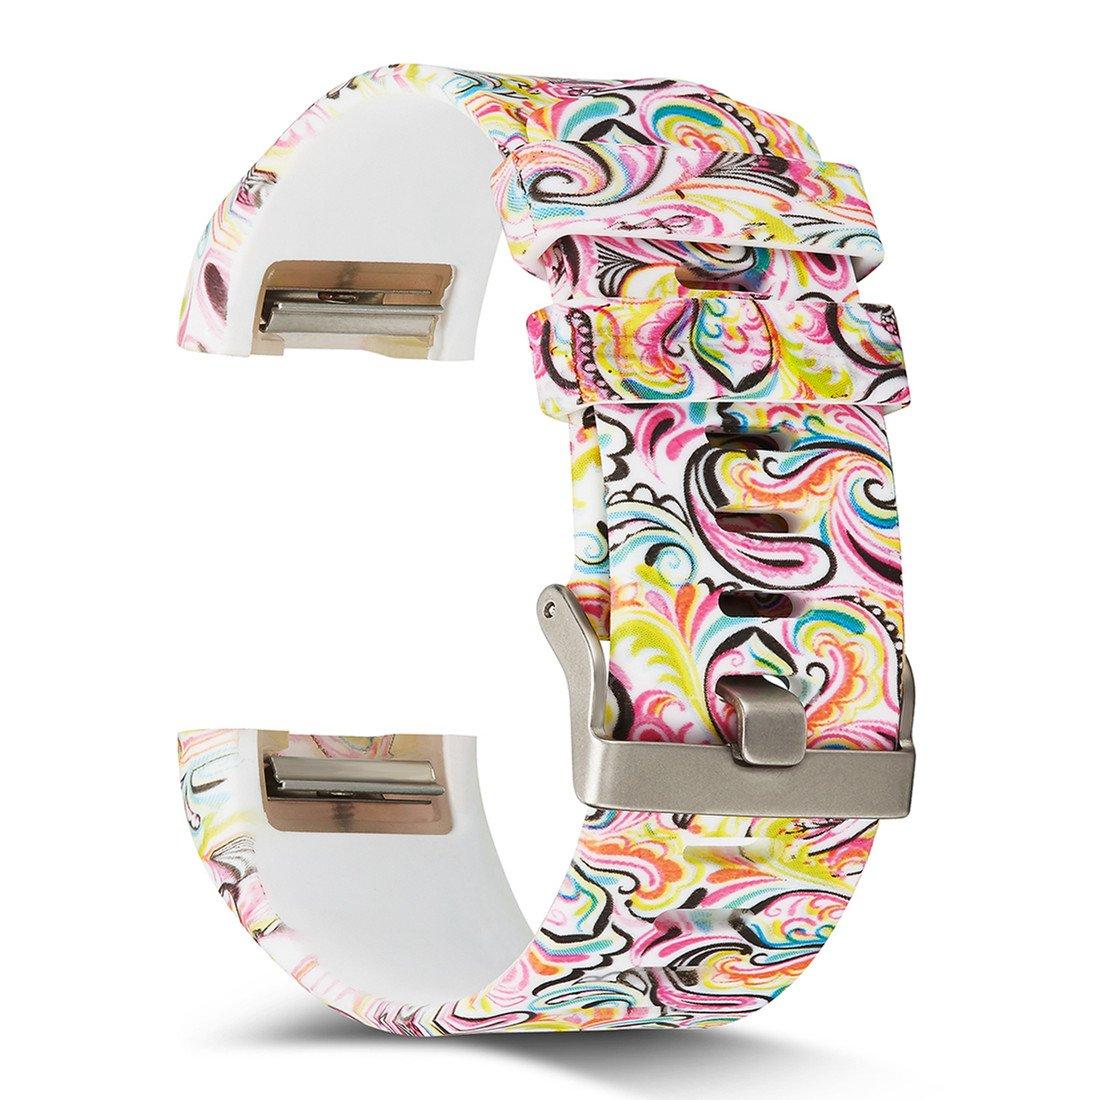 Fitbit Charge 2 バンド シリコン 調節 交換用 スポーツベルト プリントバンド クラシックバックル Charge 2 HR用 心拍数 + フィットネス リストバンド B075D5V7X6 Pattern-12 S